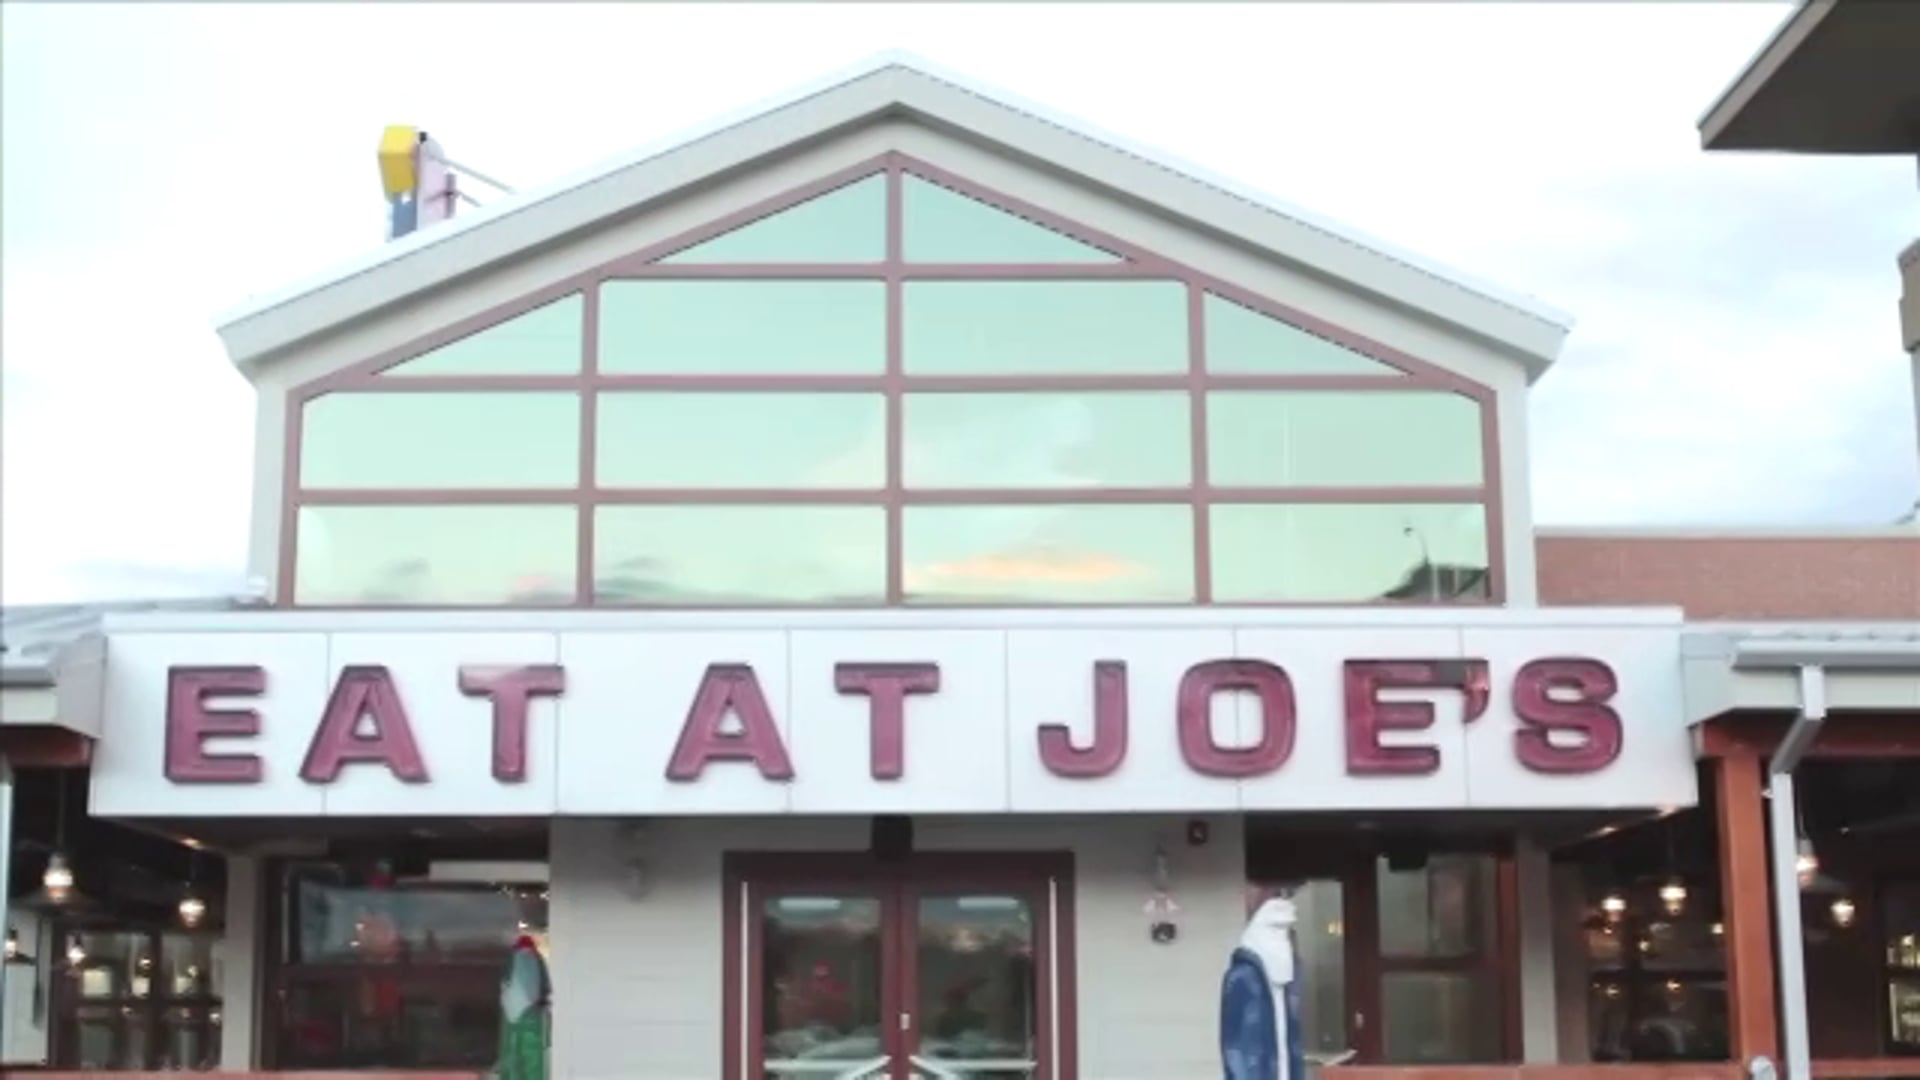 Joe's Crab Shack 100% Shore